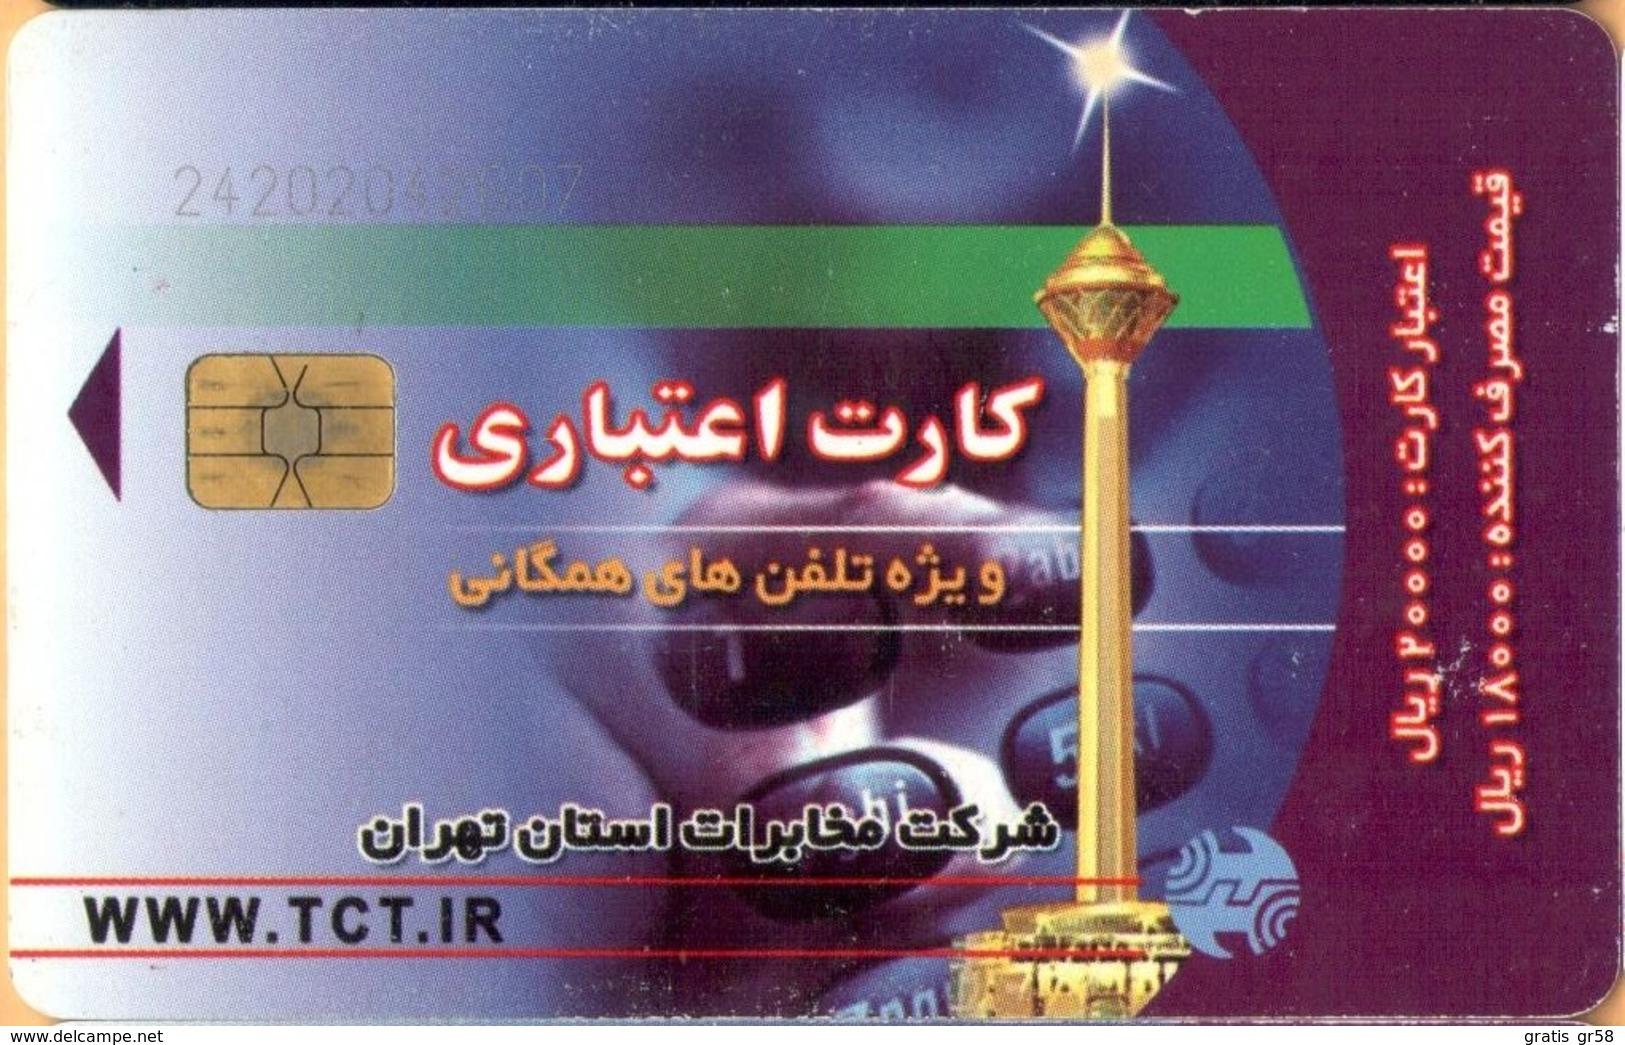 Iran - TCT, IN-Telecom-chip 059, Amirkabir, Used As Scan - Iran